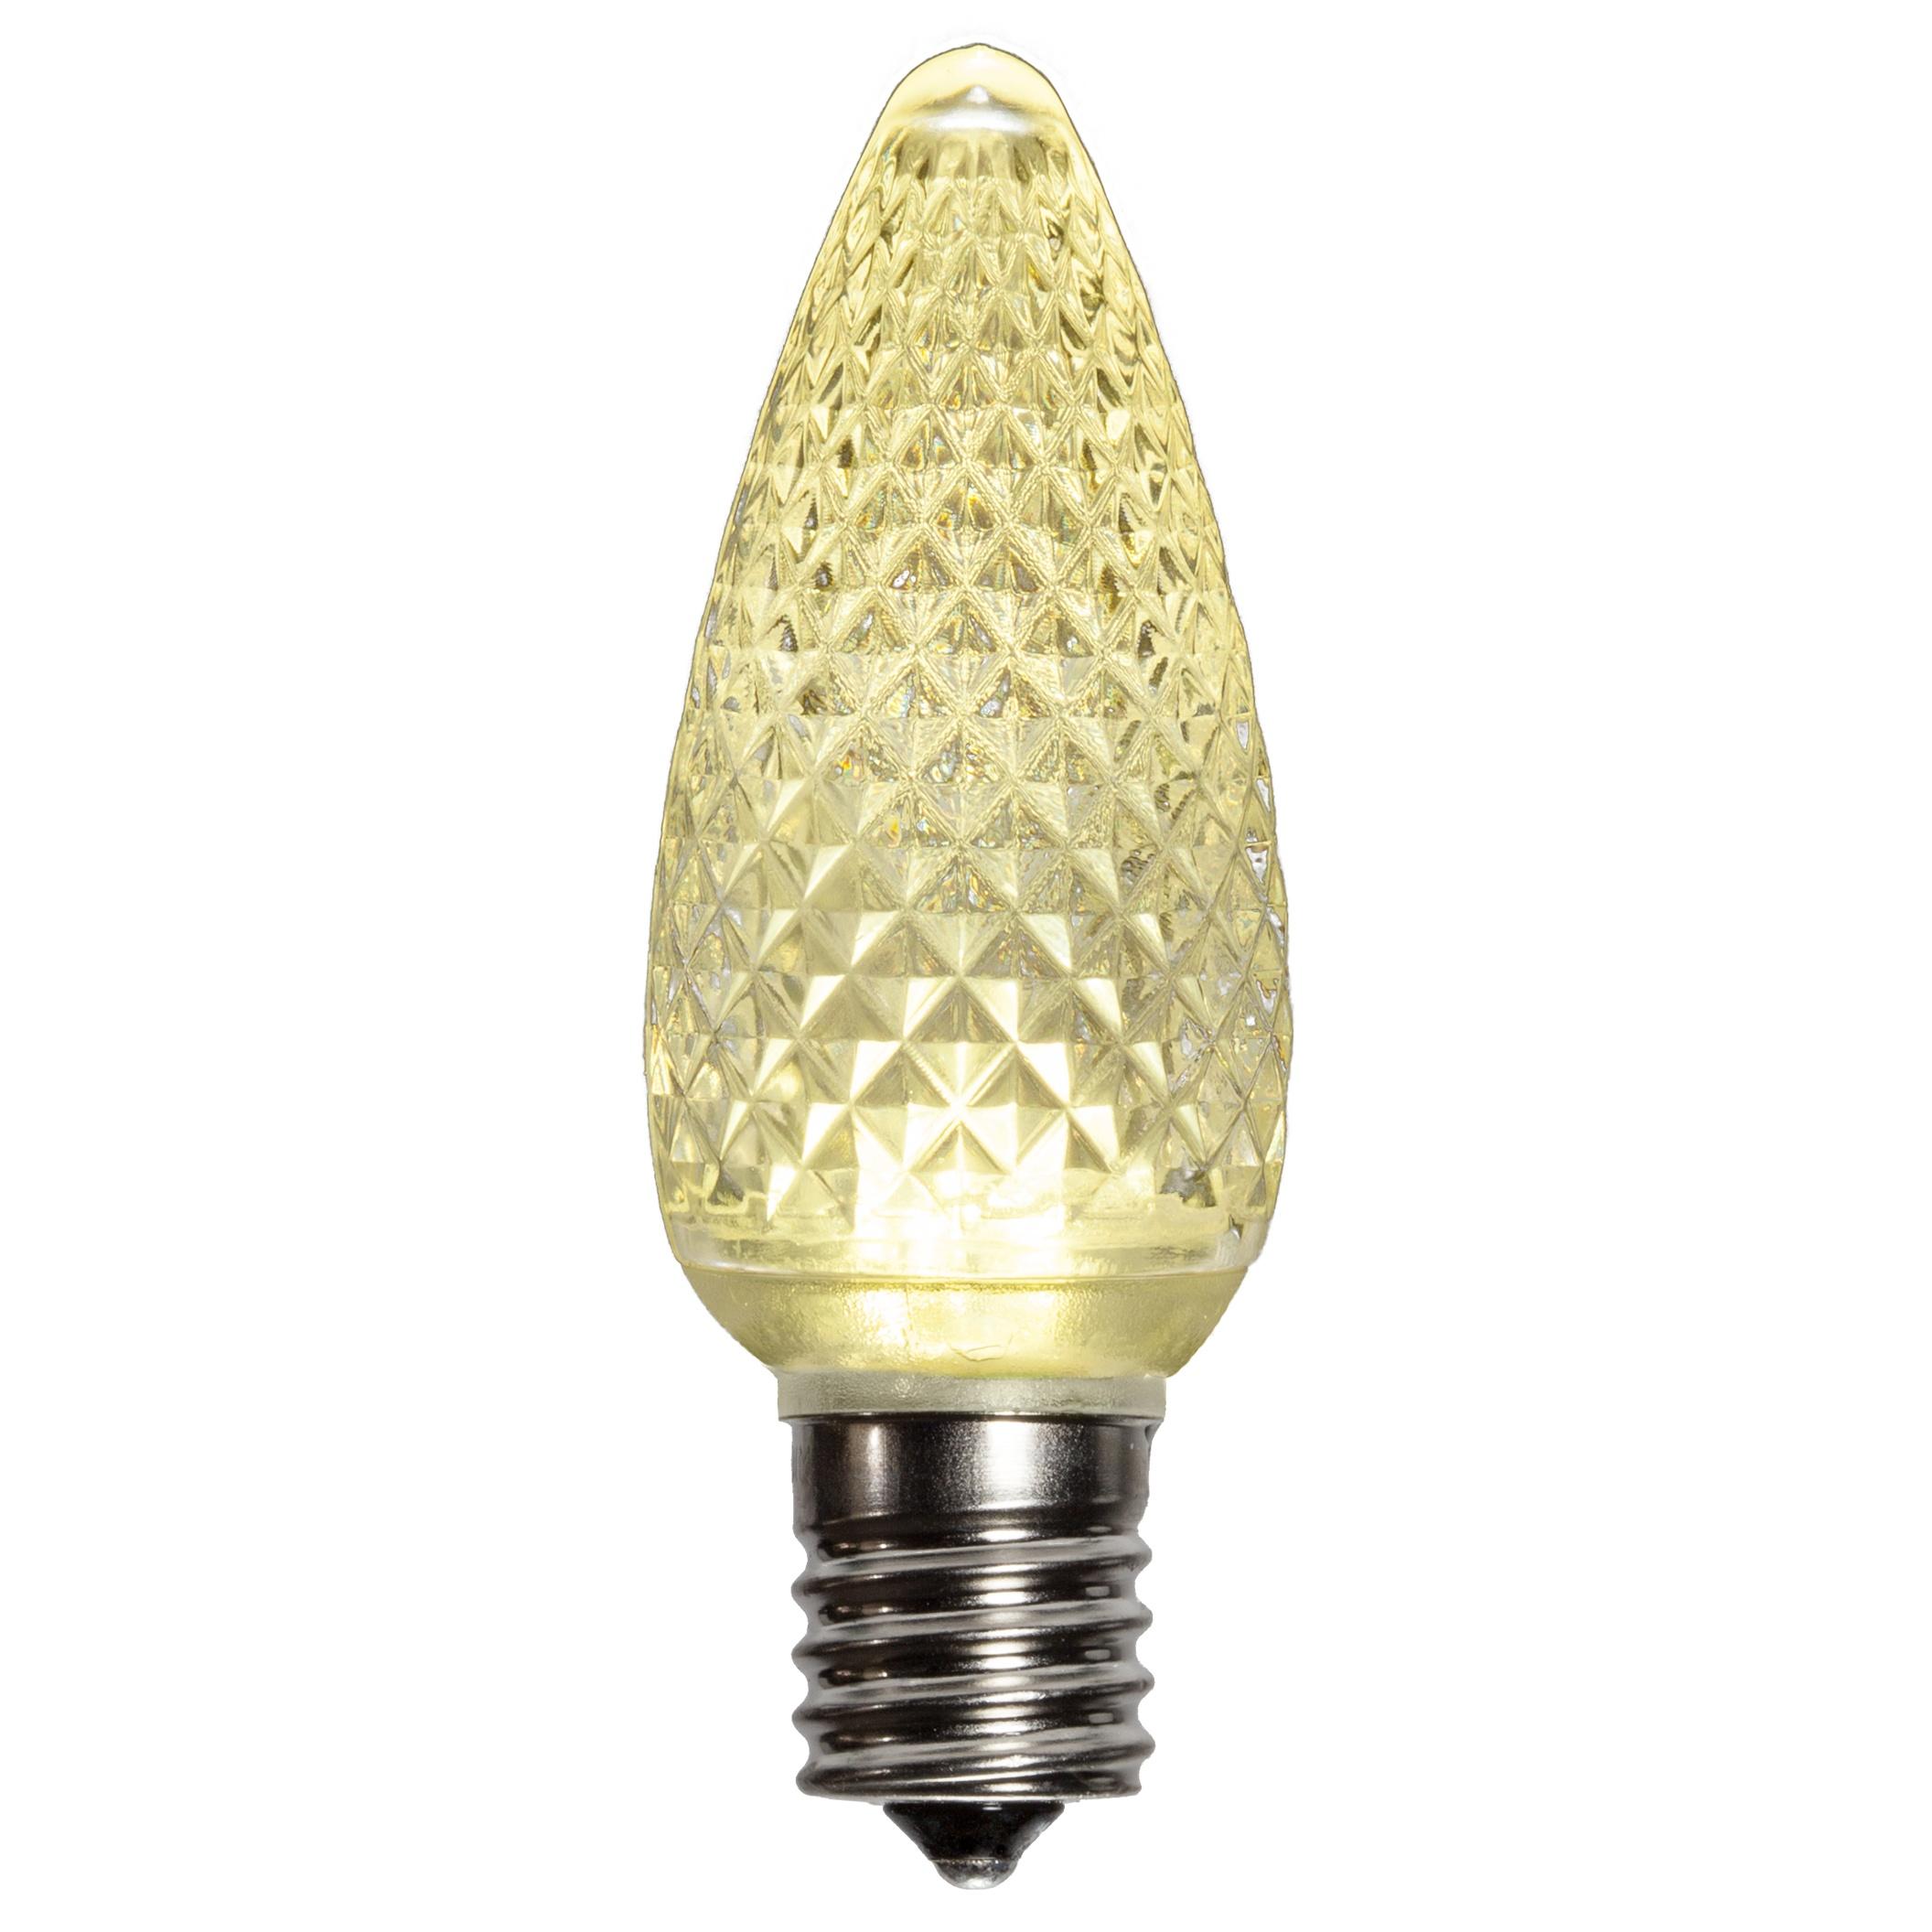 c9 warm white led christmas light bulbs. Black Bedroom Furniture Sets. Home Design Ideas